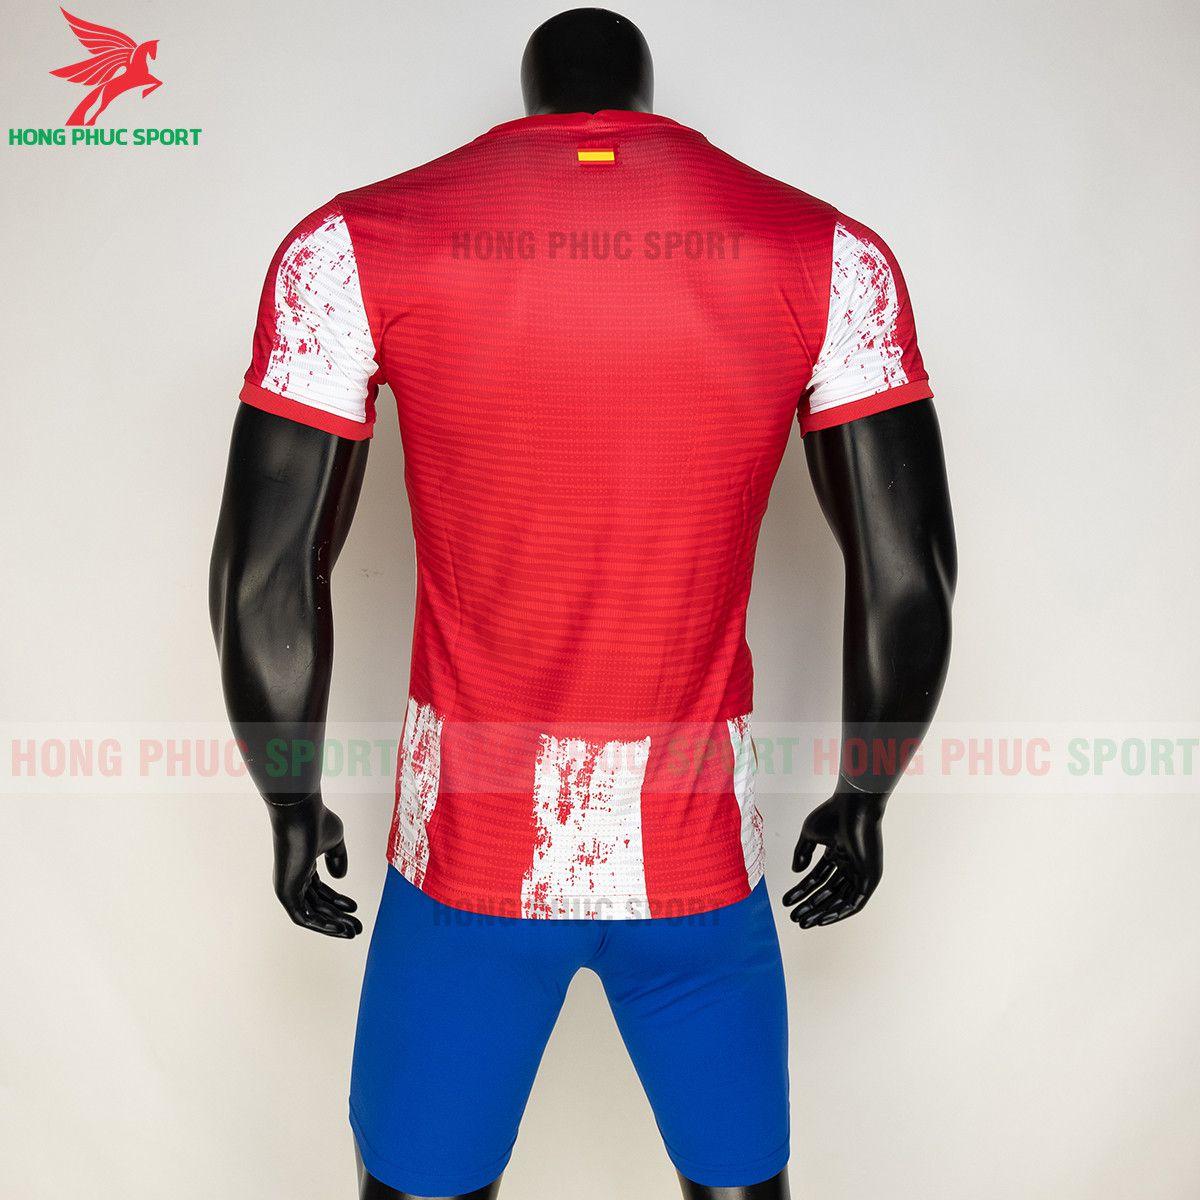 https://cdn.hongphucsport.com/unsafe/s4.shopbay.vn/files/285/ao-bong-da-atletico-madrid-2021-22-san-nha-thailand-61558e994b59a.jpg